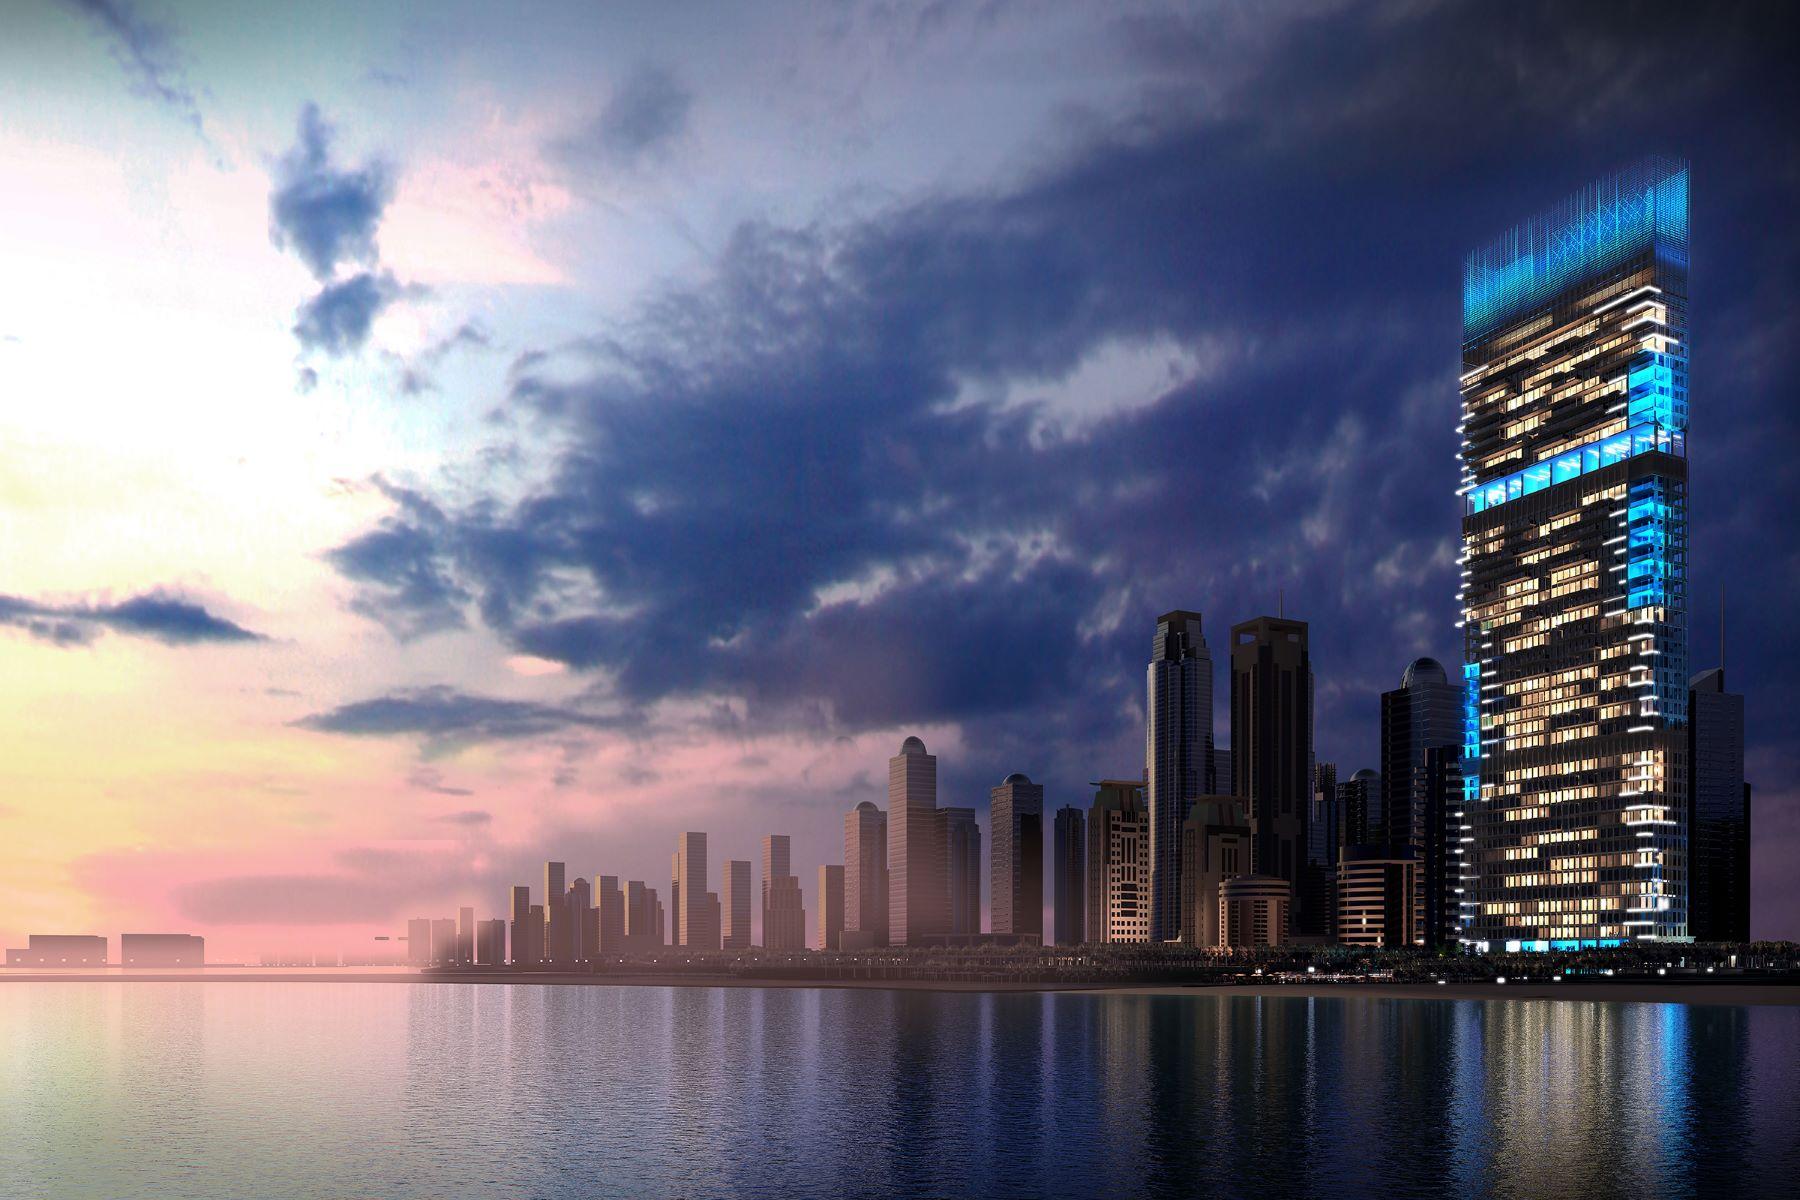 Apartment for Sale at Luxury Beachfront Penthouse in 1/JBR JBR 1 JBR, Dubai, 00000 United Arab Emirates